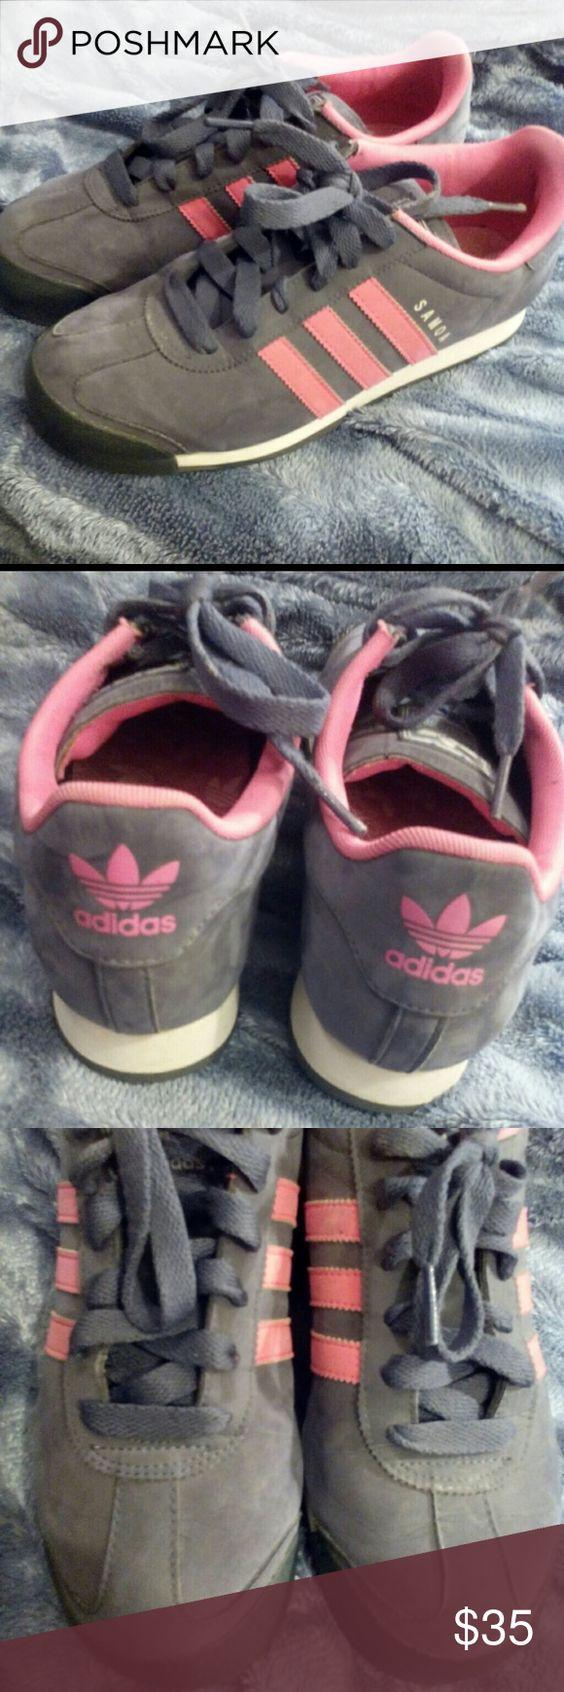 Adidas Samoa Grey/Pink size 7.5 Adidas Samoa Grey/Pink women size 7 1/2. Great condition adidas Shoes